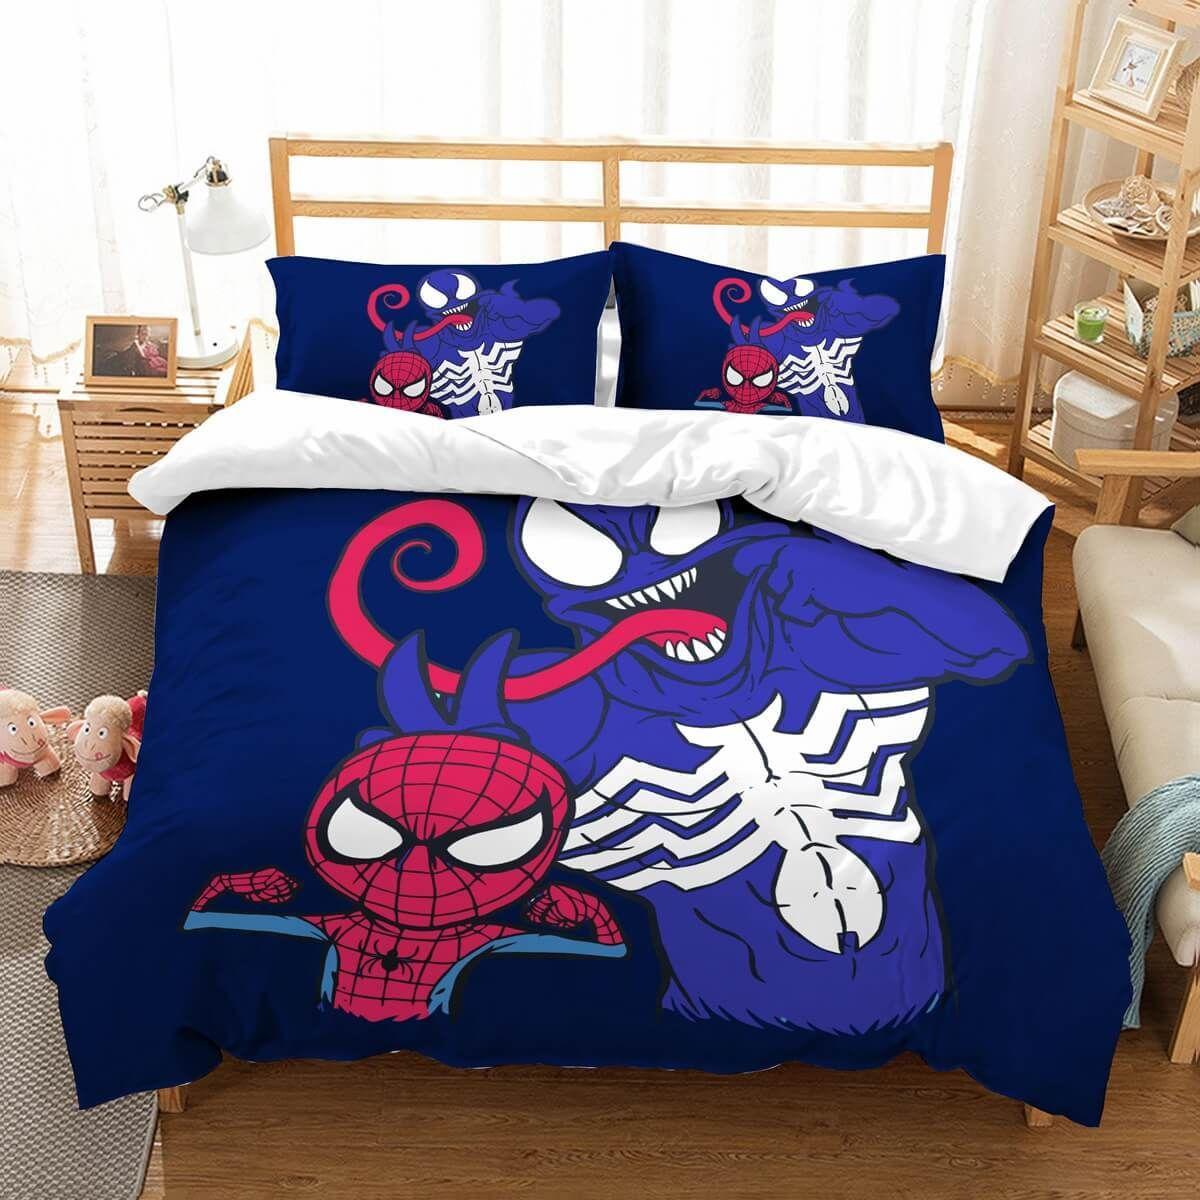 3d Customize Venom Spider Man Bedding Set Duvet Cover Set